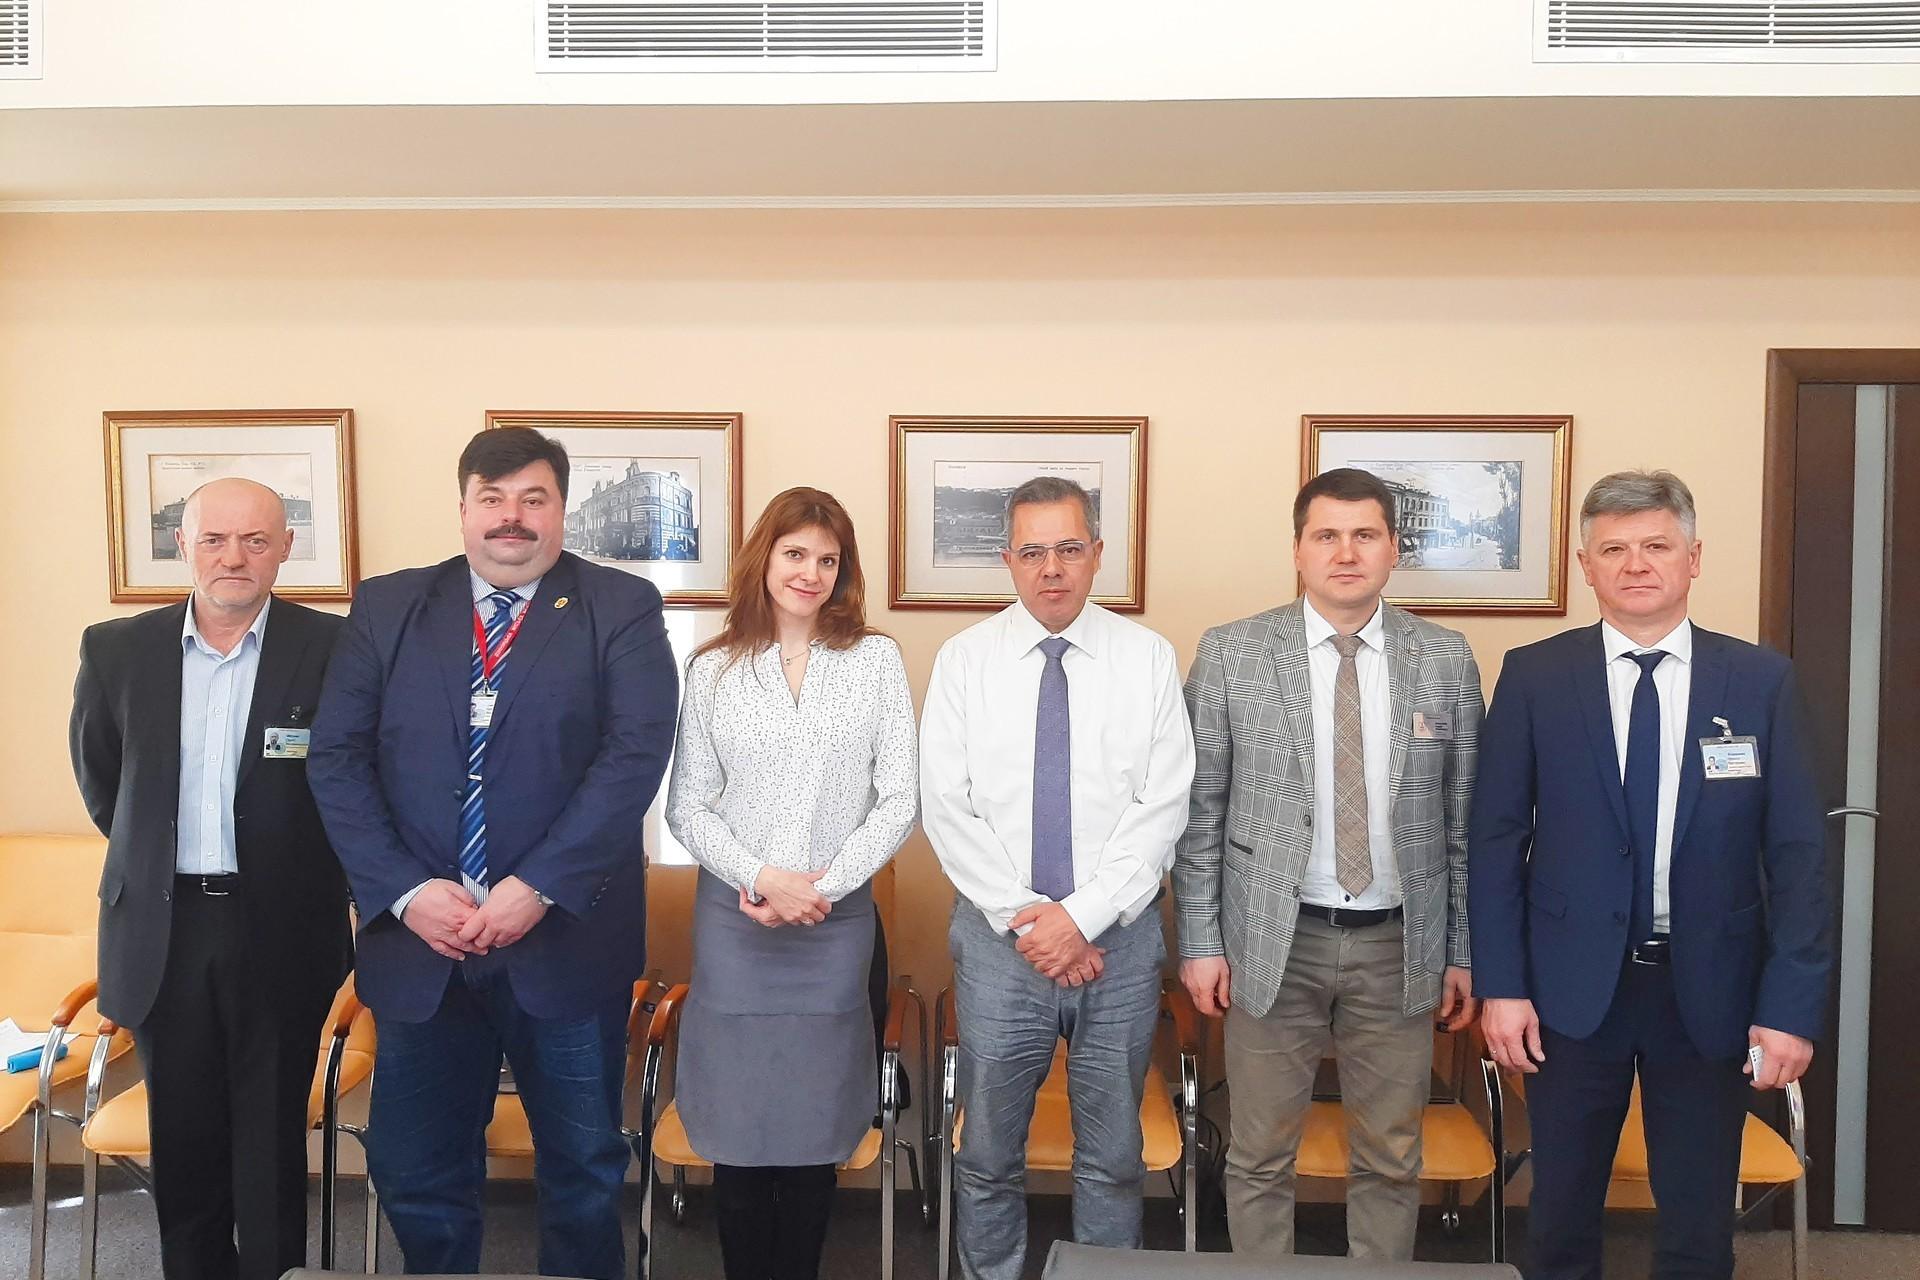 Vinnytsia attracts new investor